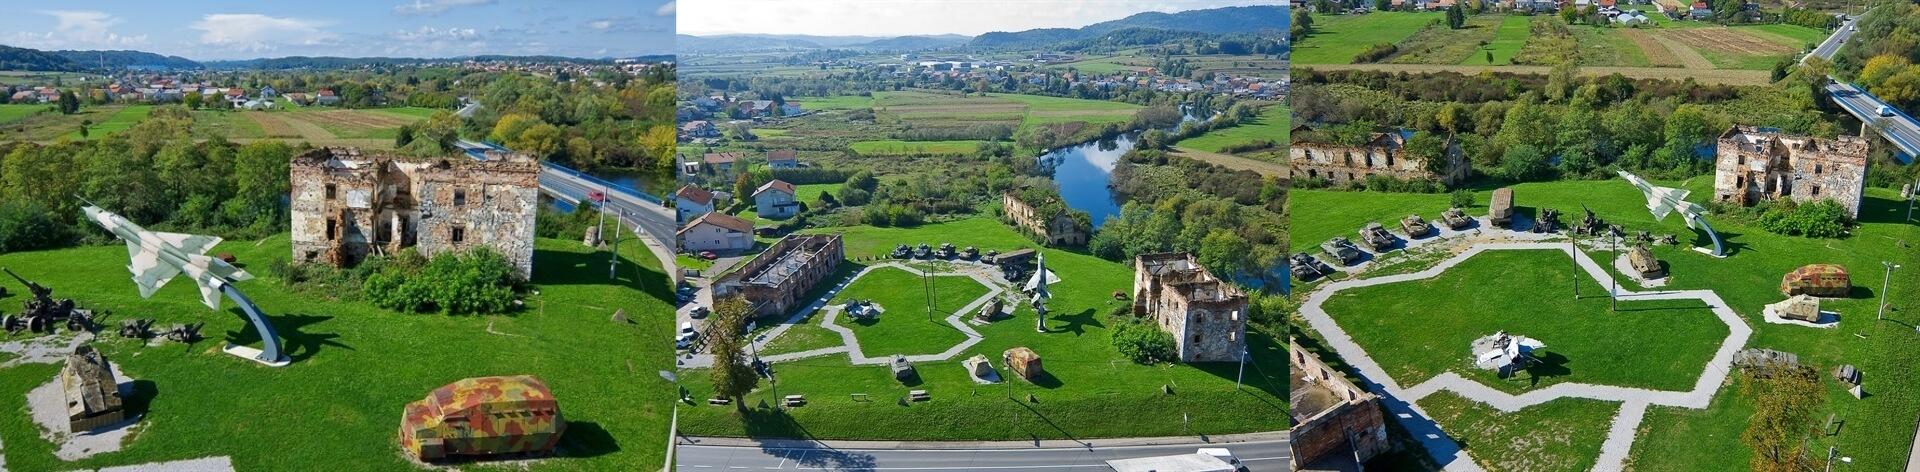 Museum of Croatian war of independence